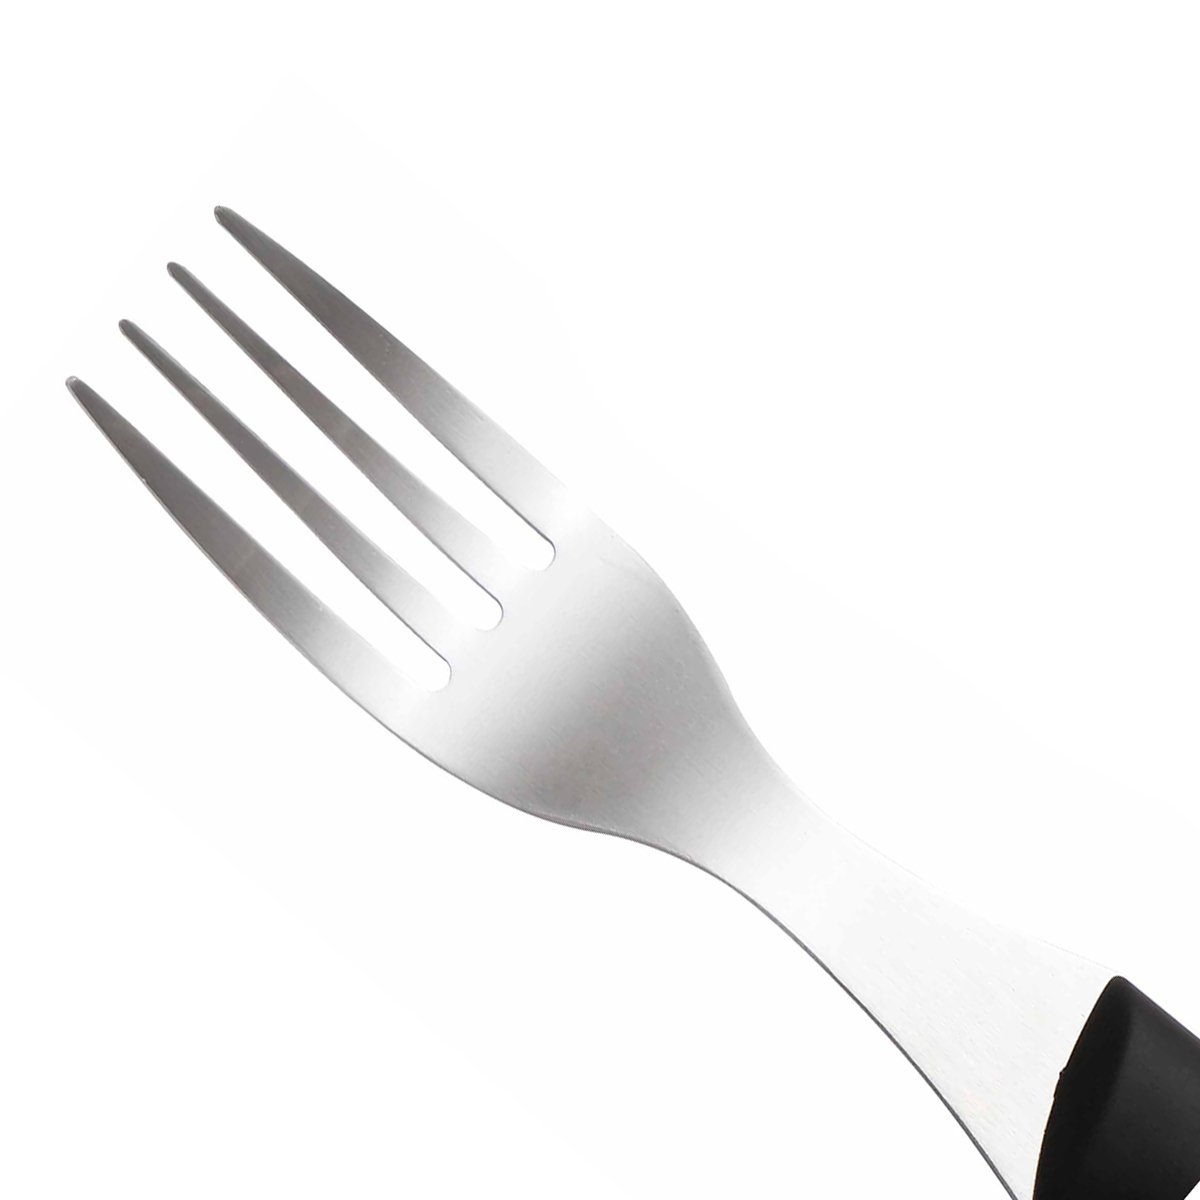 Amazon.com: Bergner Home MasterPro Gourmet Matching Steak Knife ...